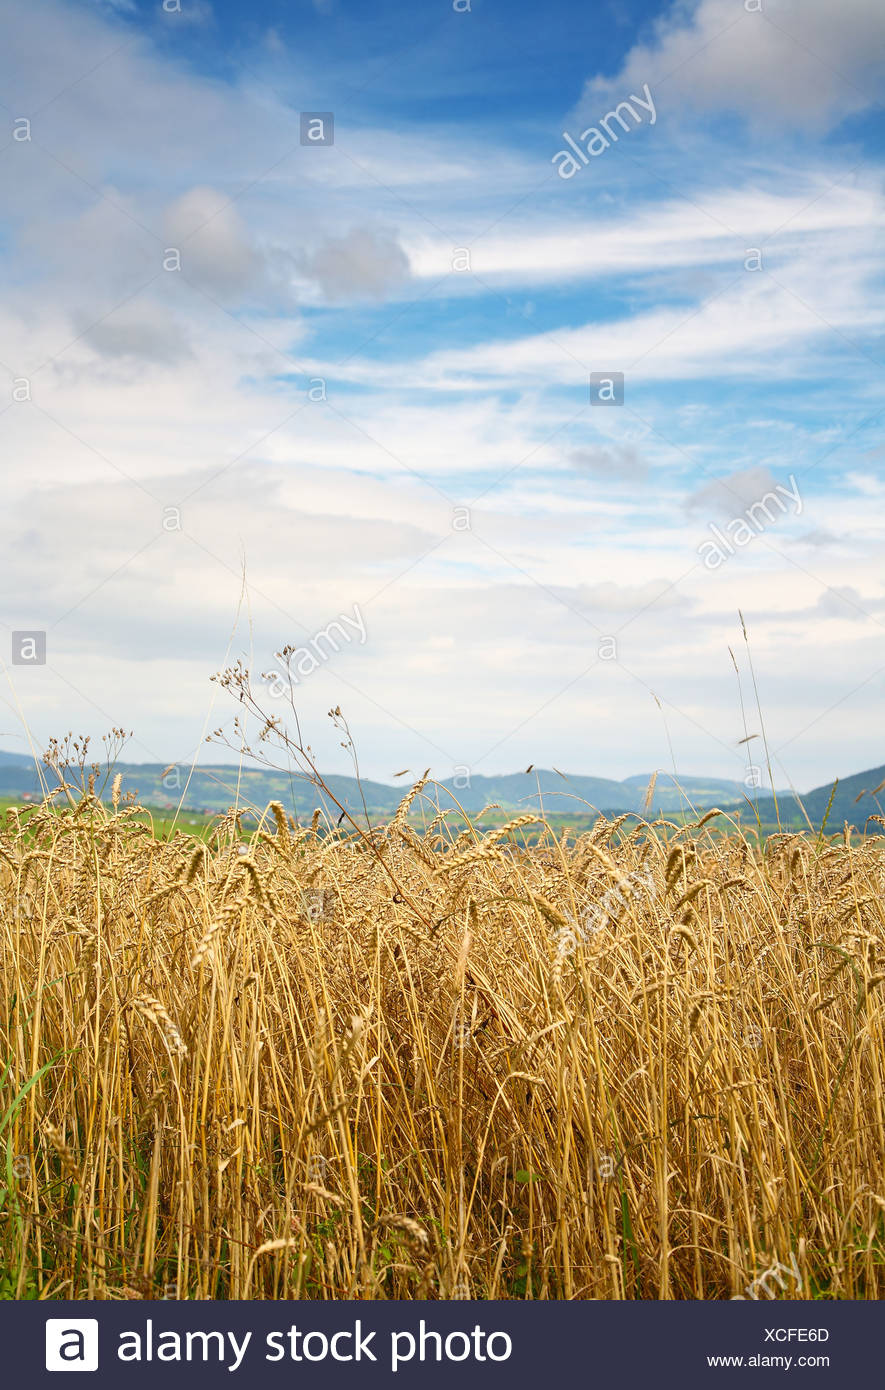 Gold wheat field - Stock Image